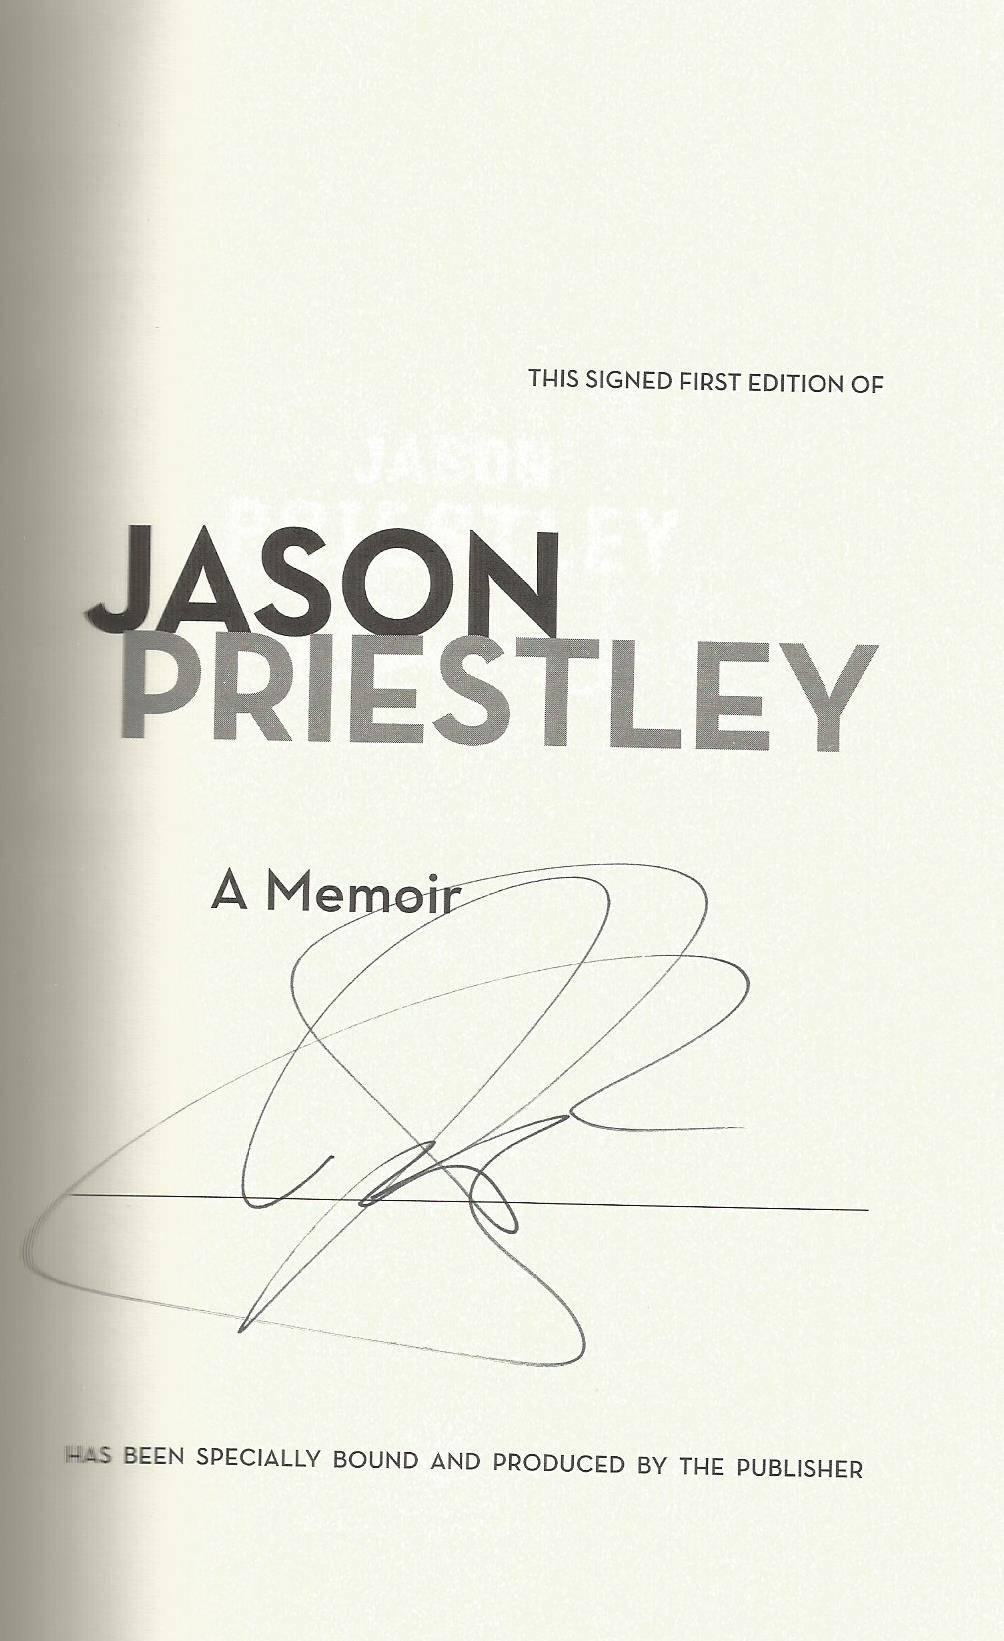 Jason Priestley